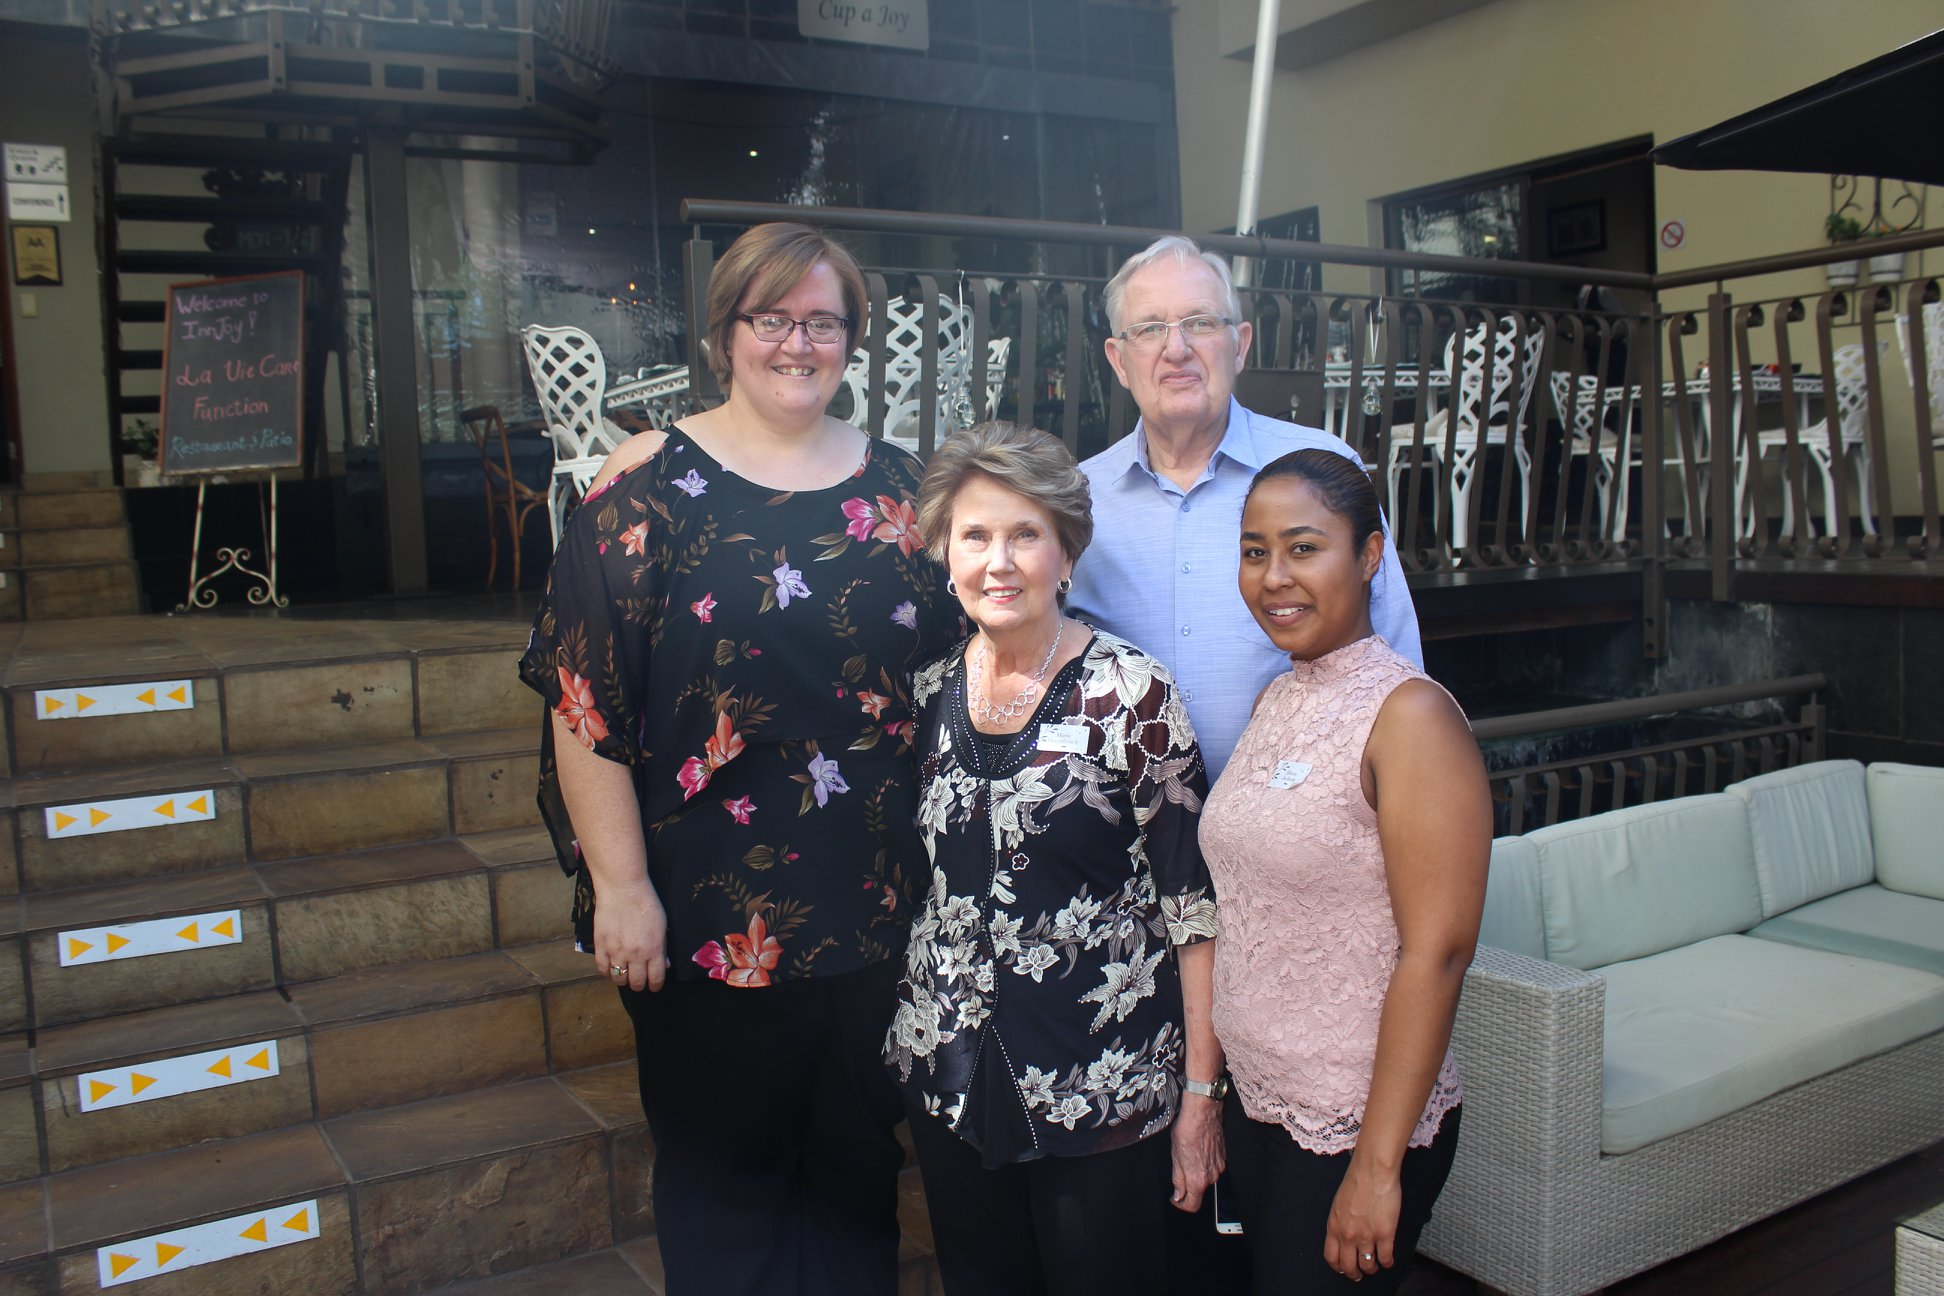 La Vie Care Brentmed Staff